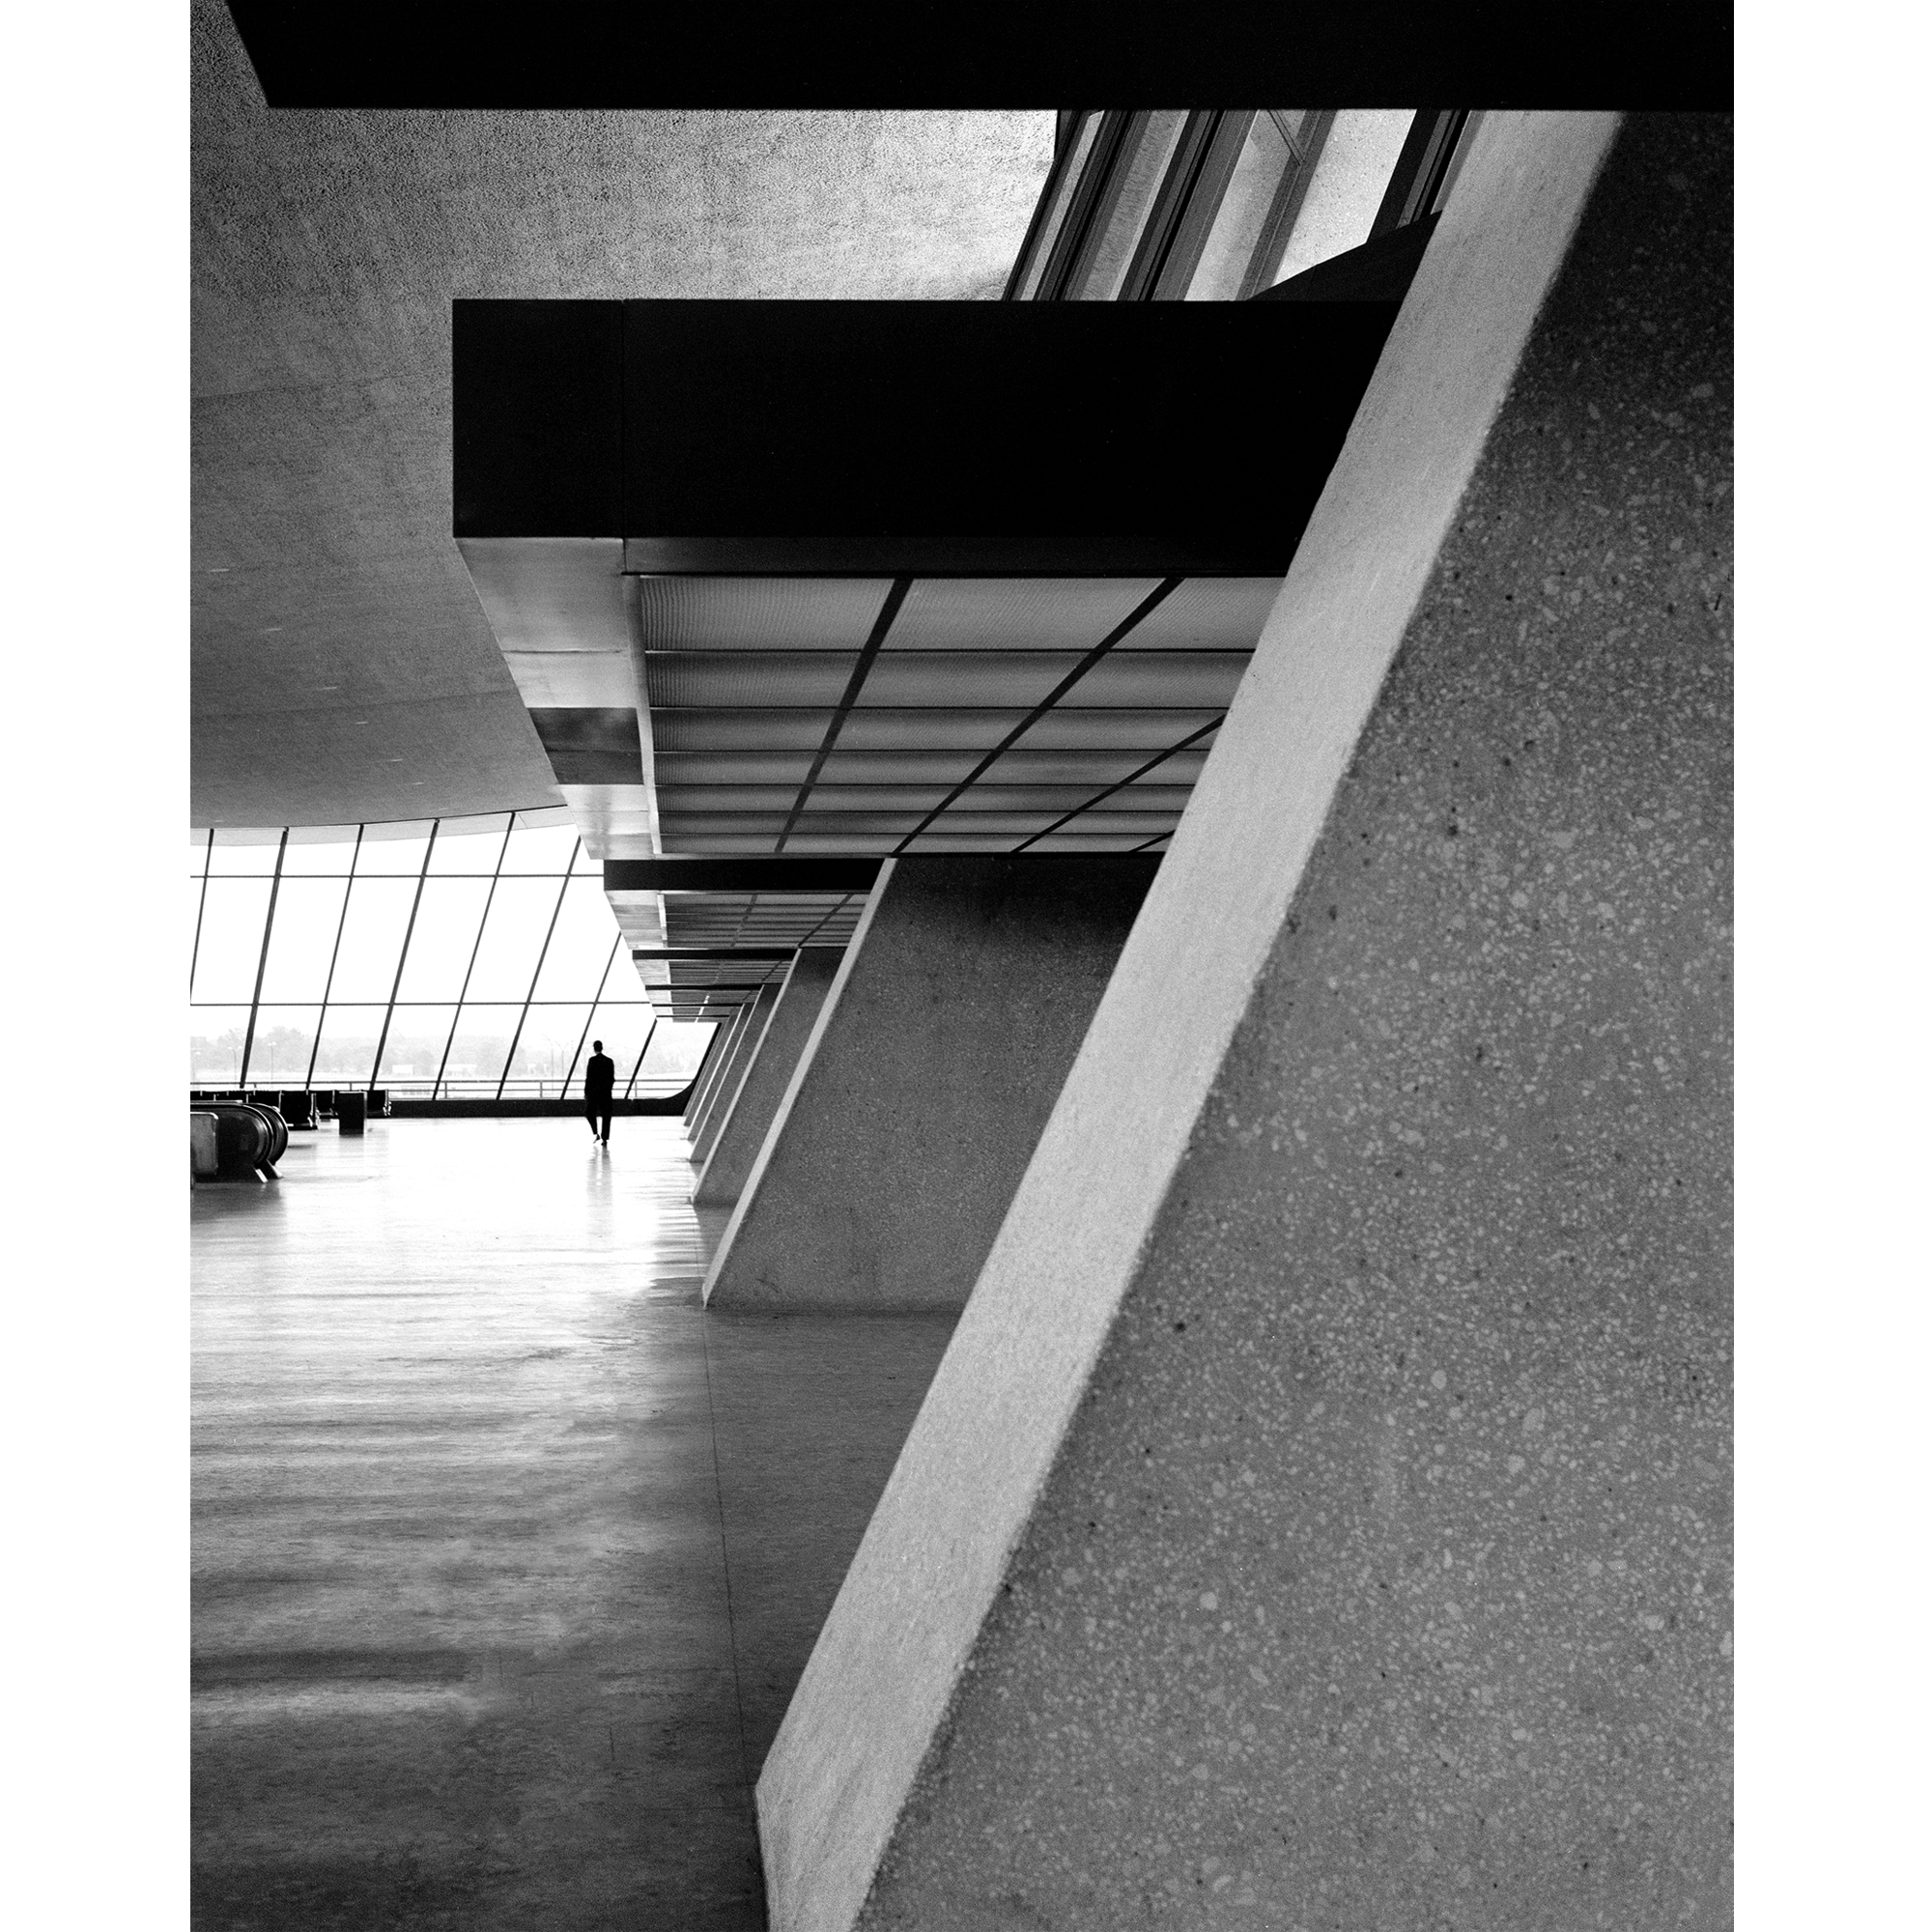 DULLES_CONCOURSE_8x10.png